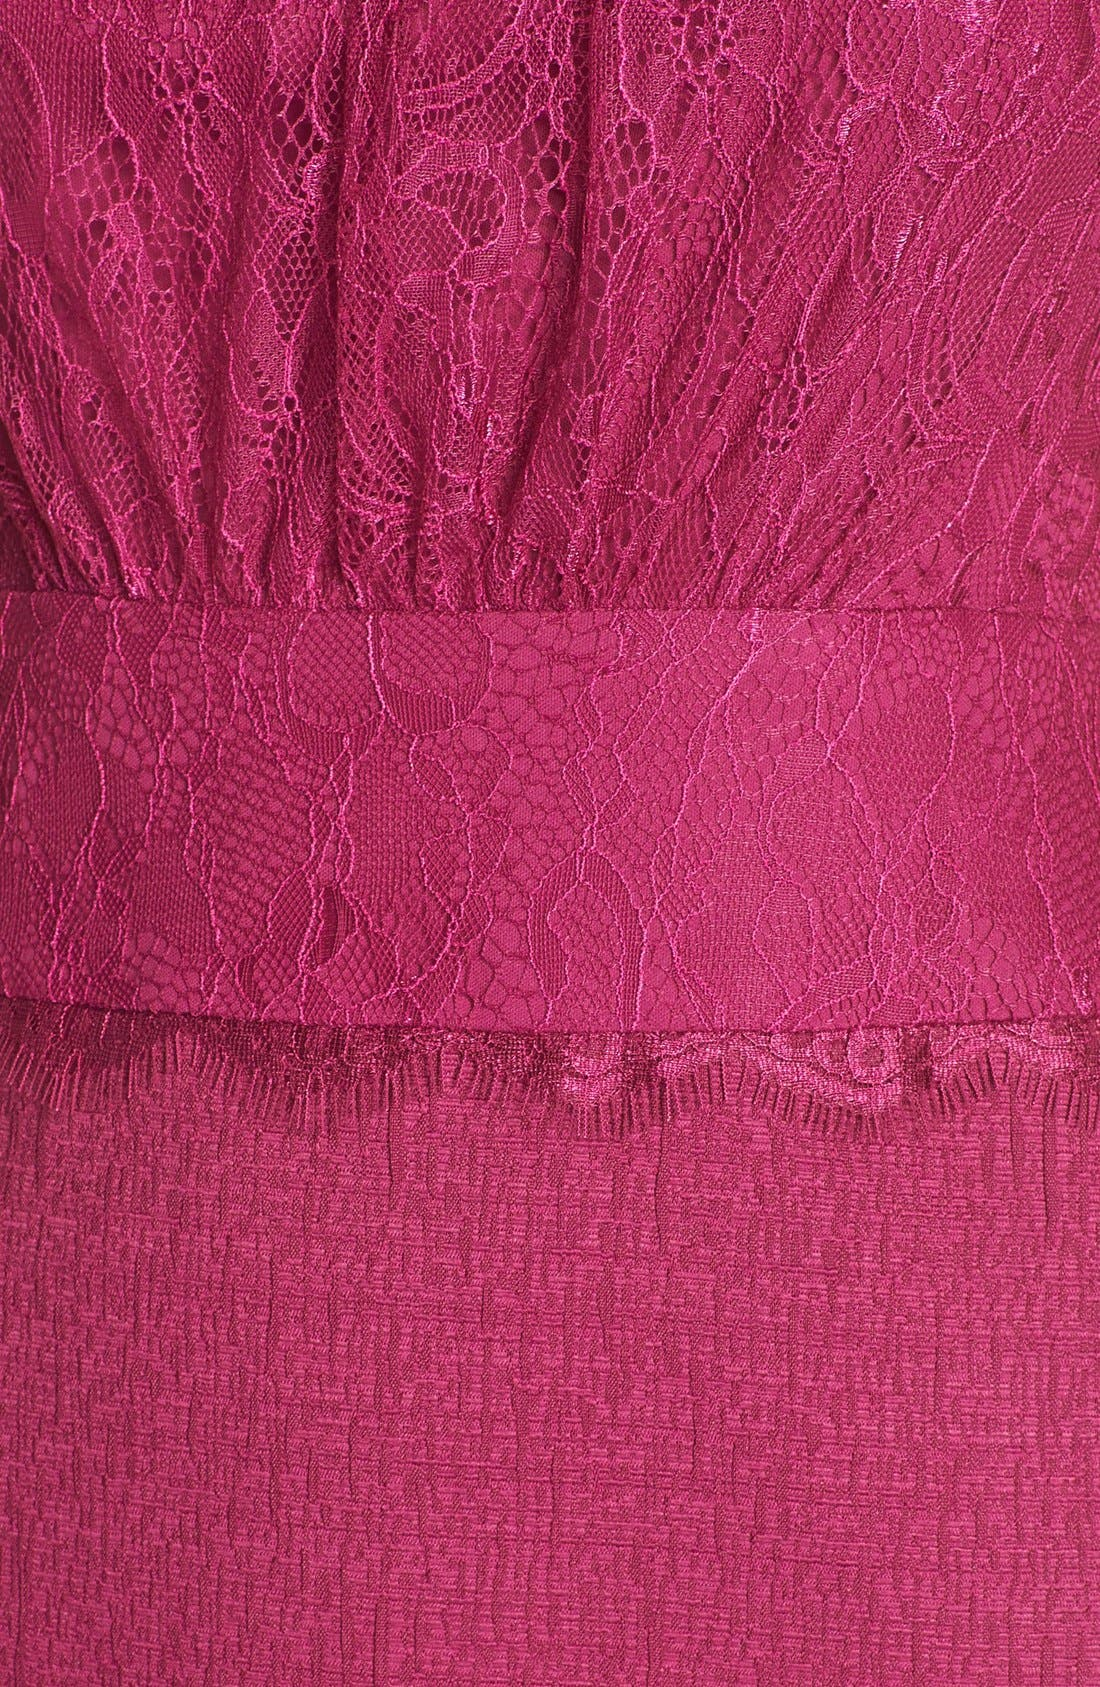 Alternate Image 5  - Adrianna Papell Lace & Jacquard Blouson Dress (Regular & Petite)